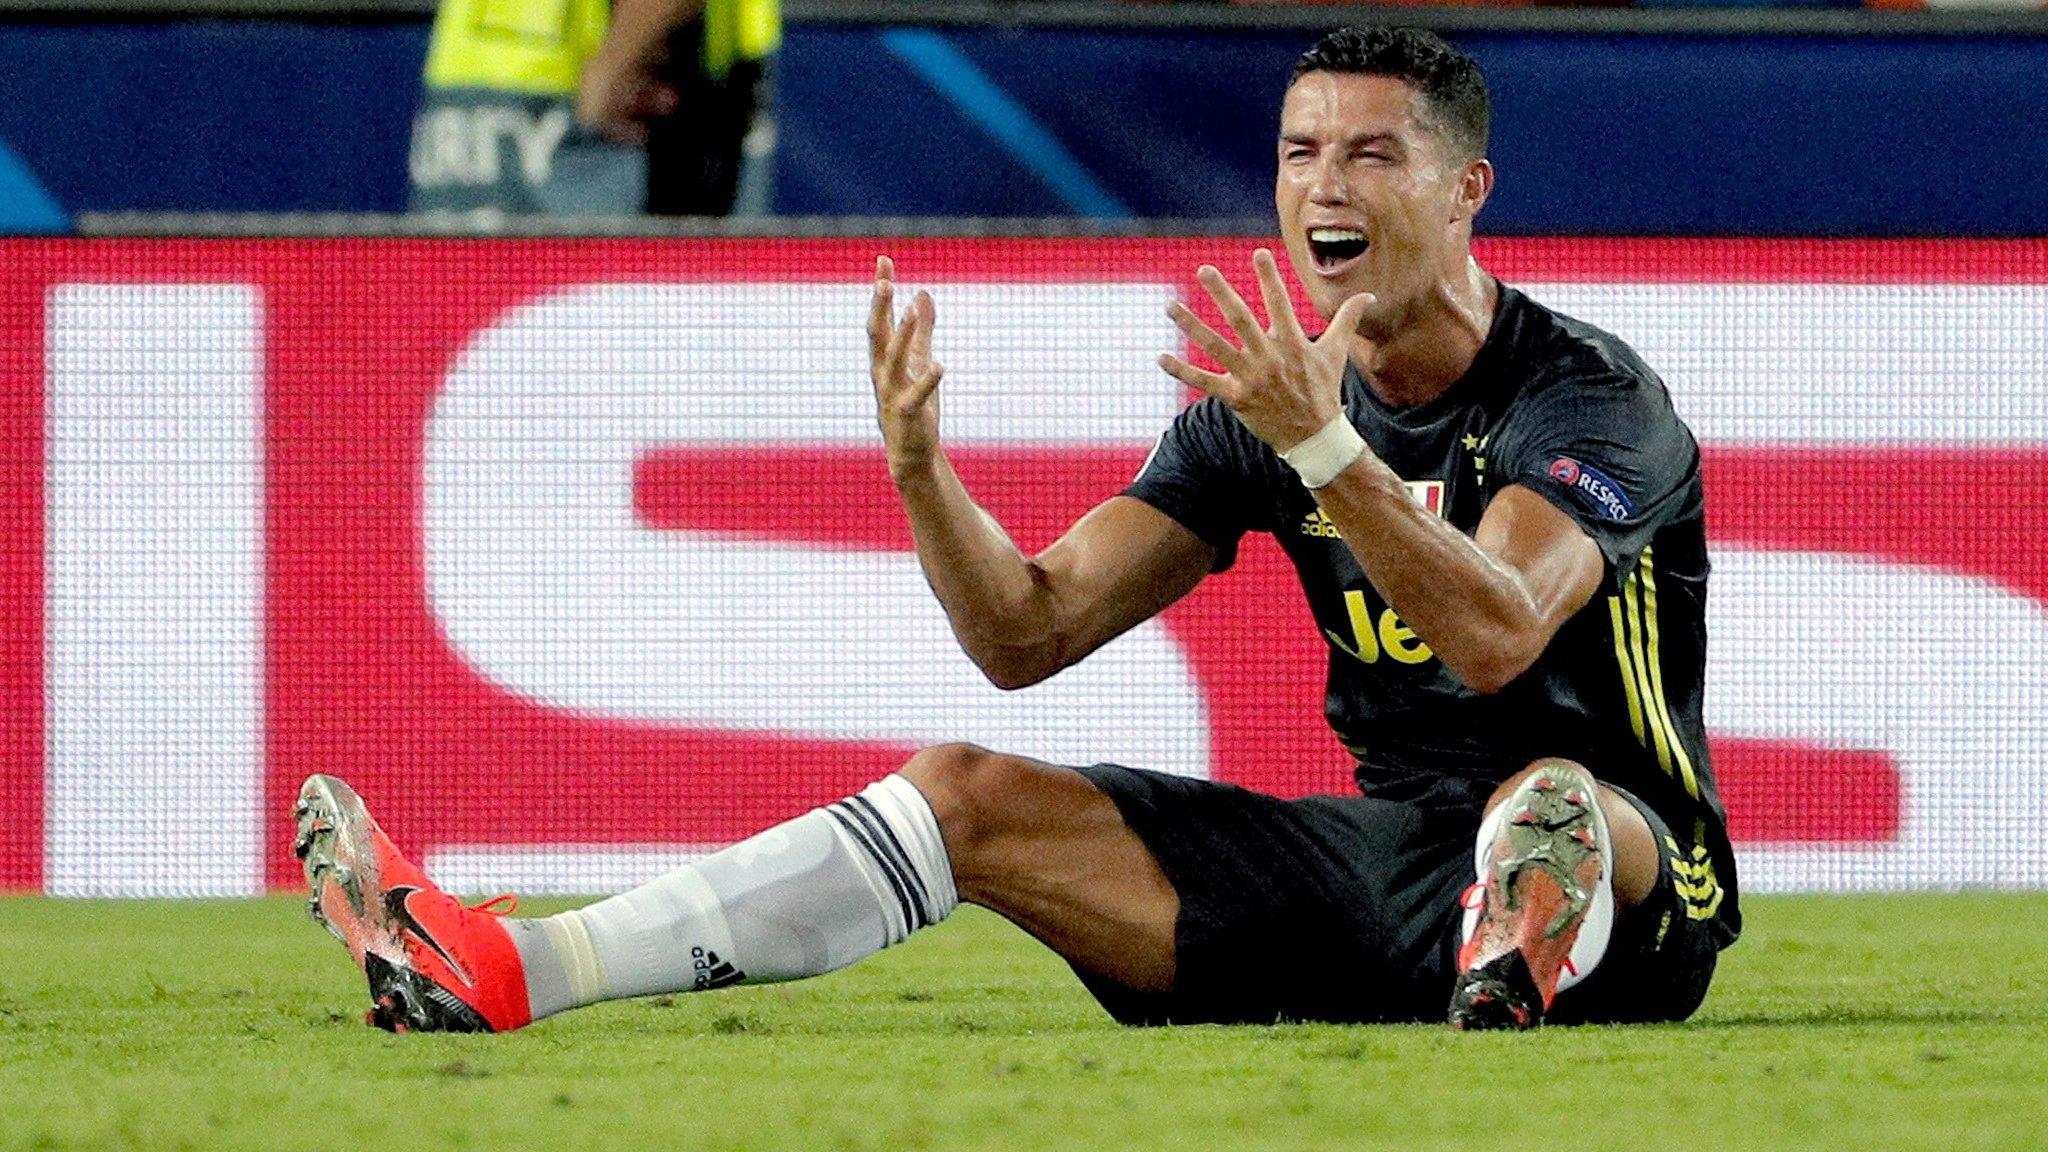 Valencia 0-2 Juventus: Cristiano Ronaldo sent off but Italians still win